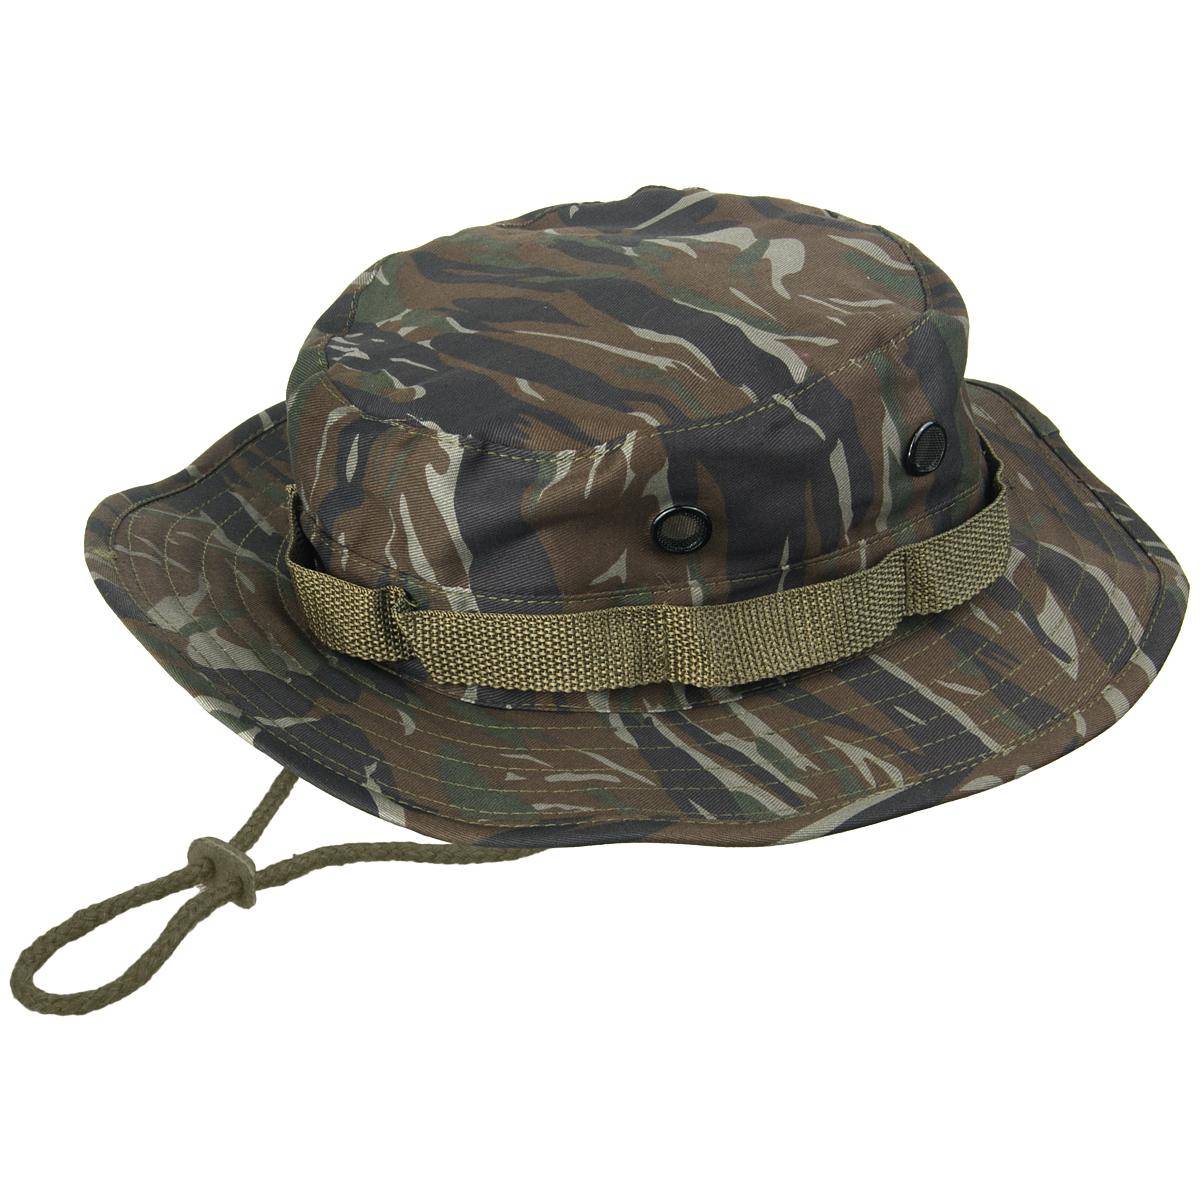 Details about MILITARY VIETNAM ARMY COMBAT GI BOONIE JUNGLE BUSH HAT TIGER  STRIPE CAMO S-XXL 265ea09fad3